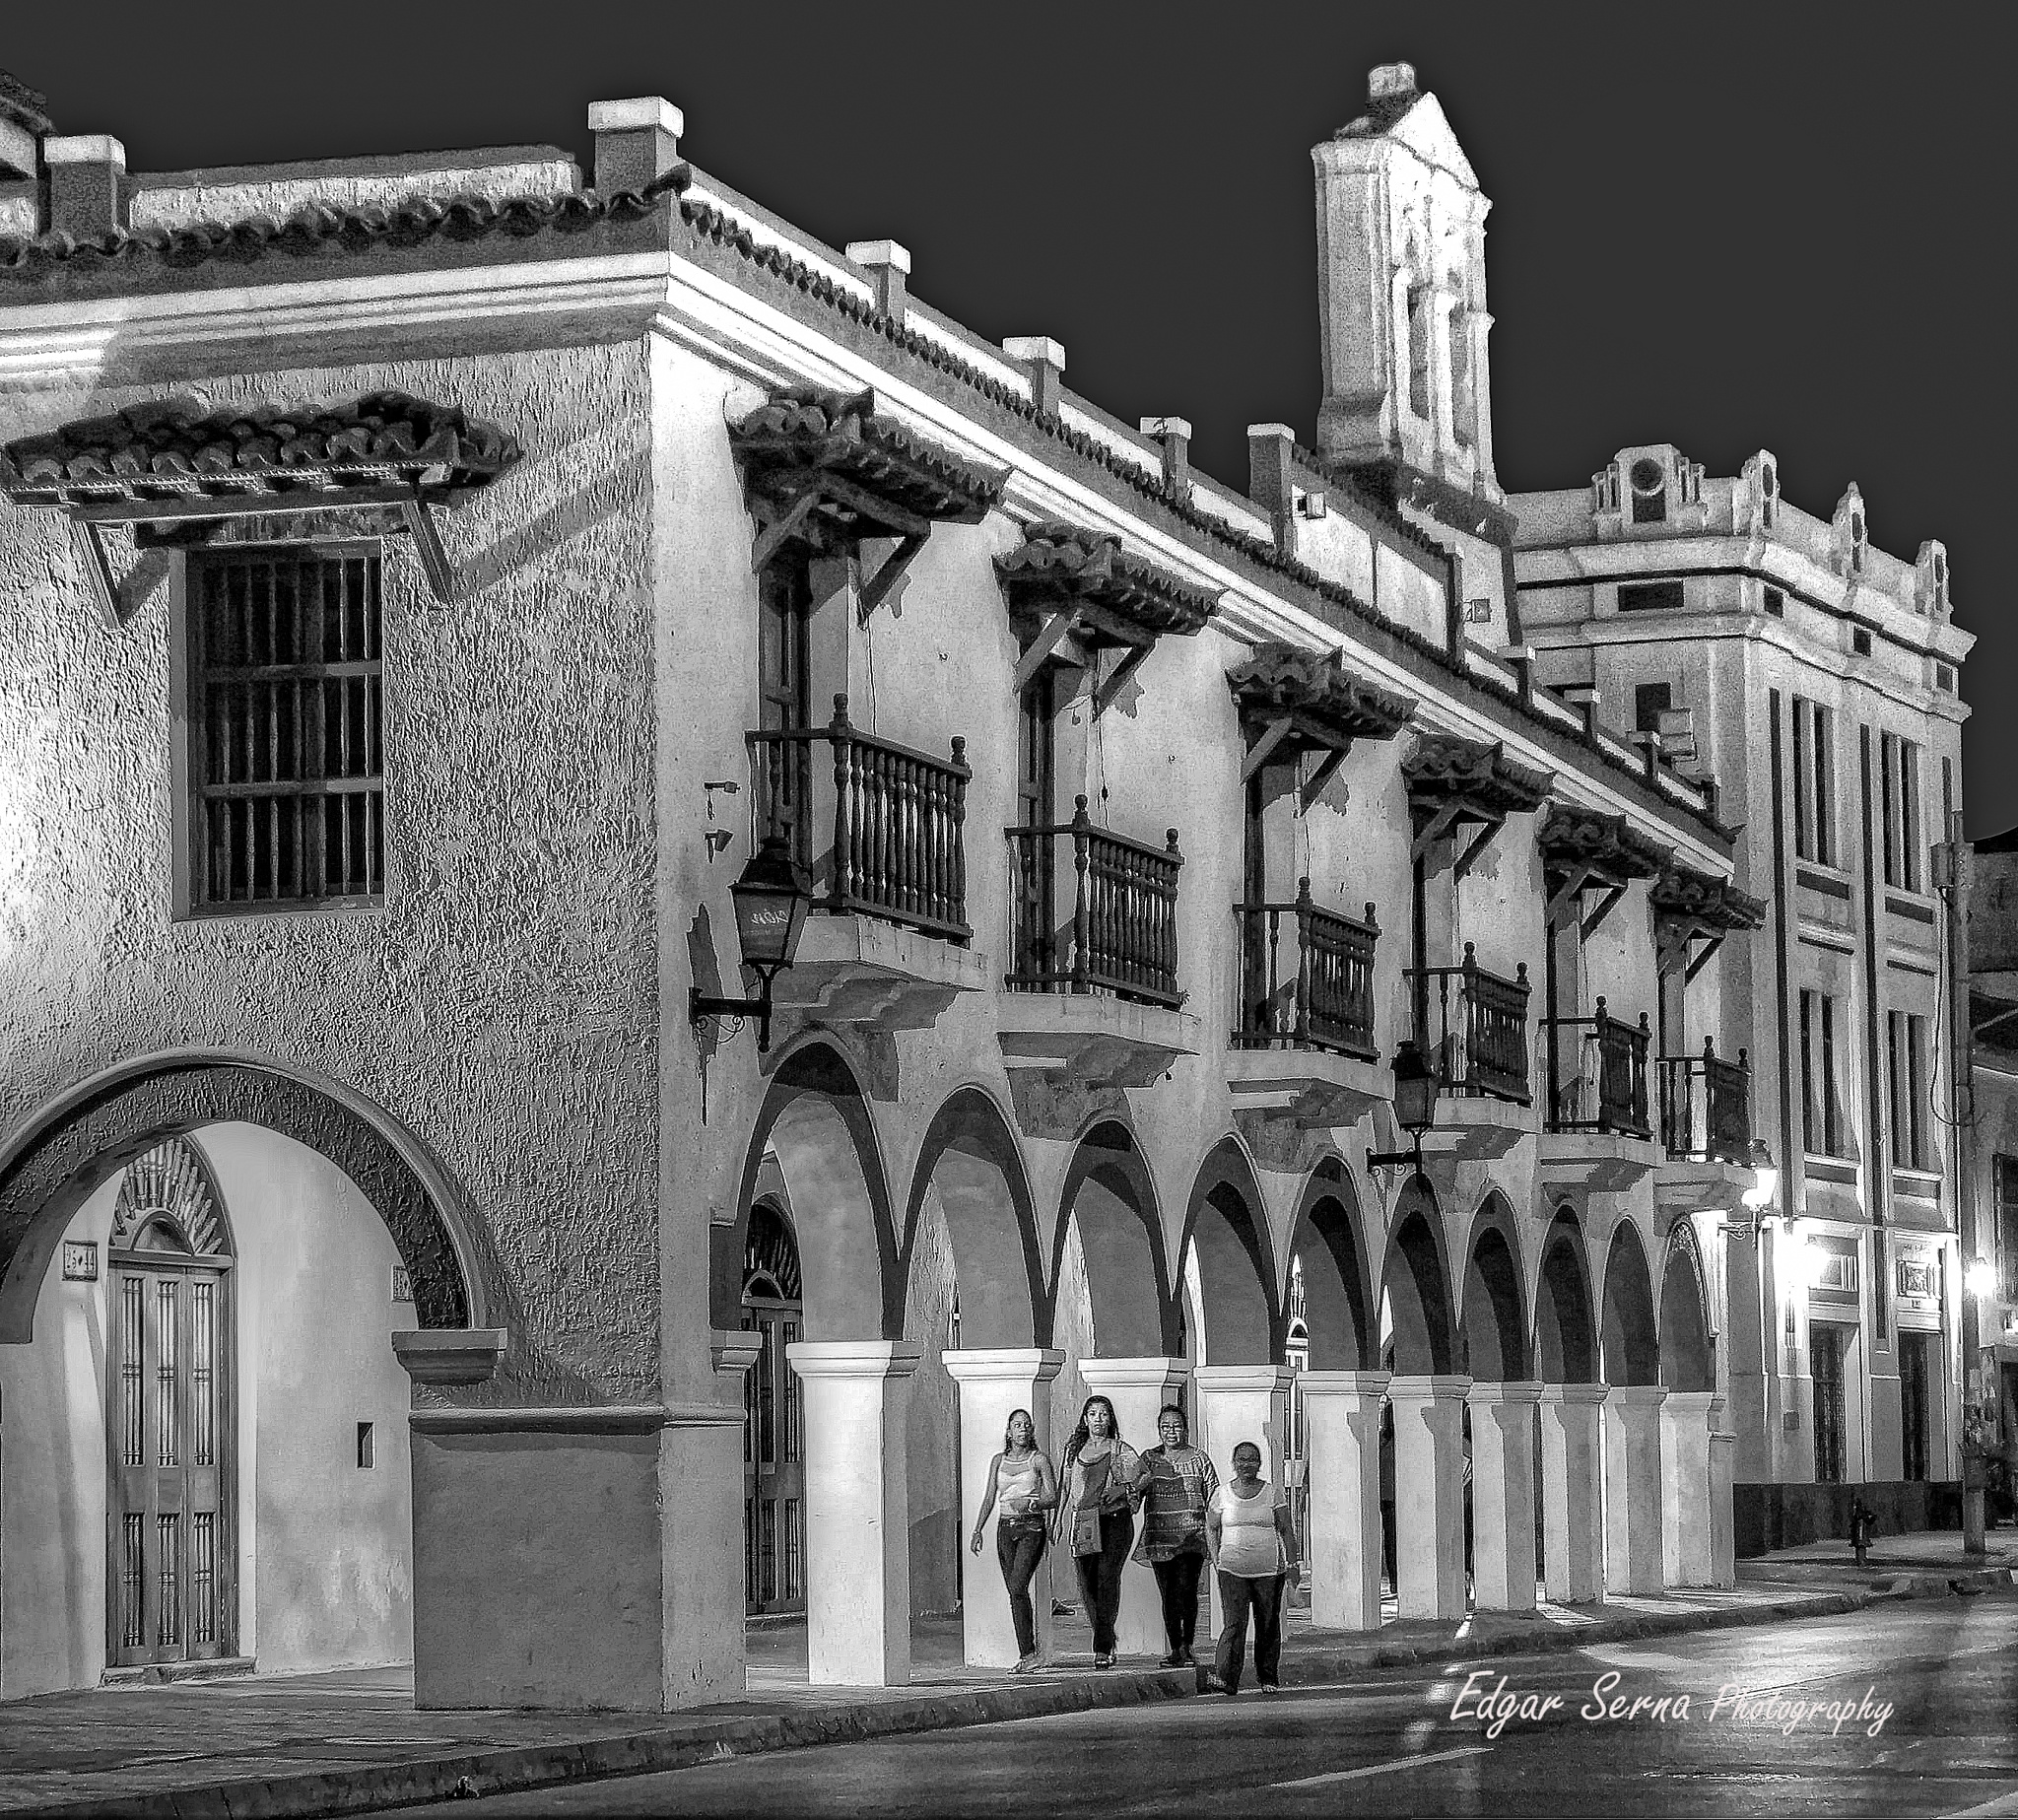 Night walking by Edgar Serna